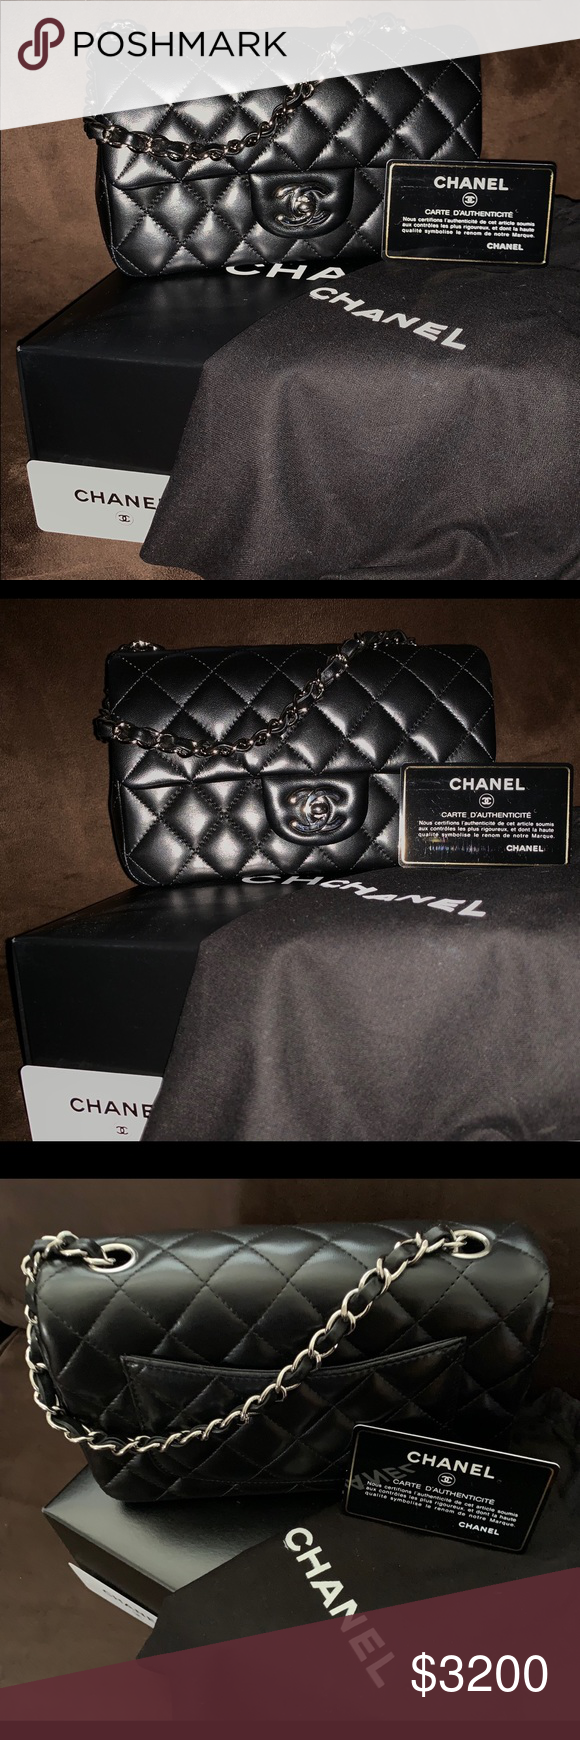 cd9e534de CHANEL mini rectangular bag Authentic Chanel mini rectangular lambskin black  leather with silver hardware. Good